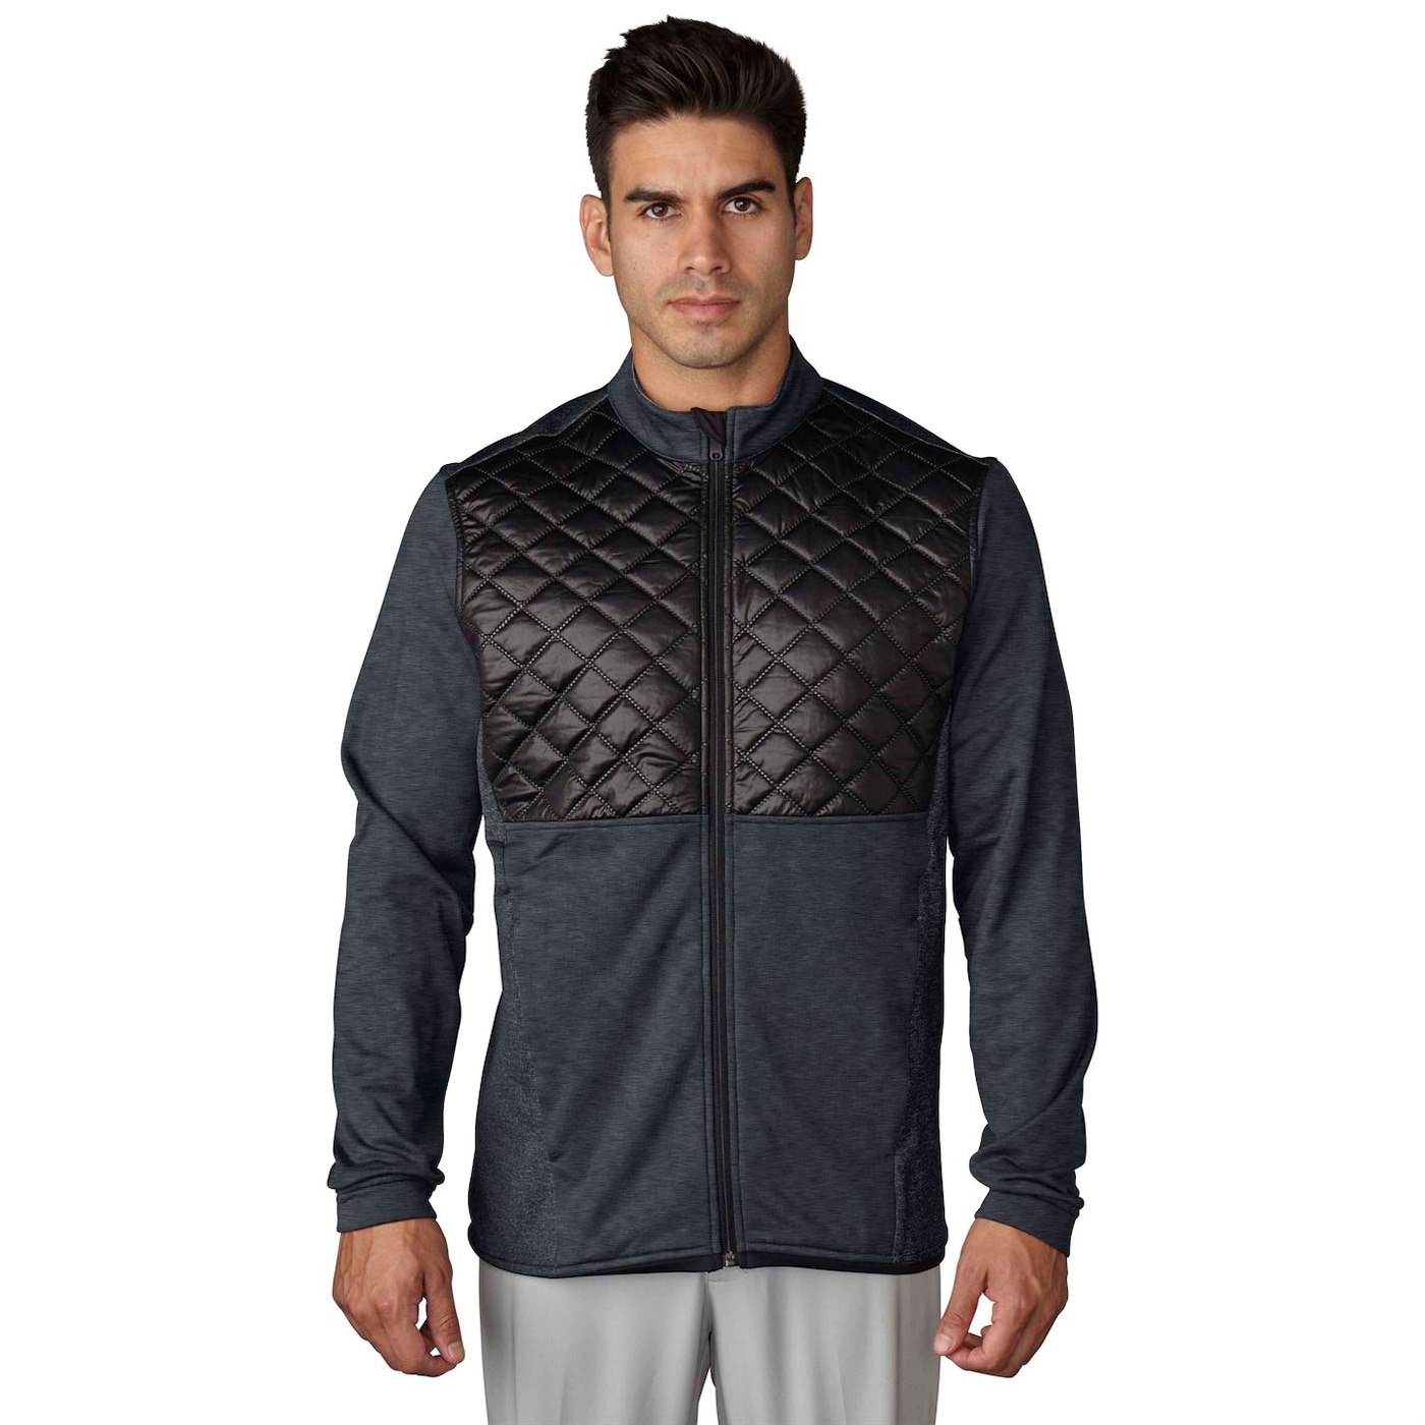 Adidas Prime Jacket Mens